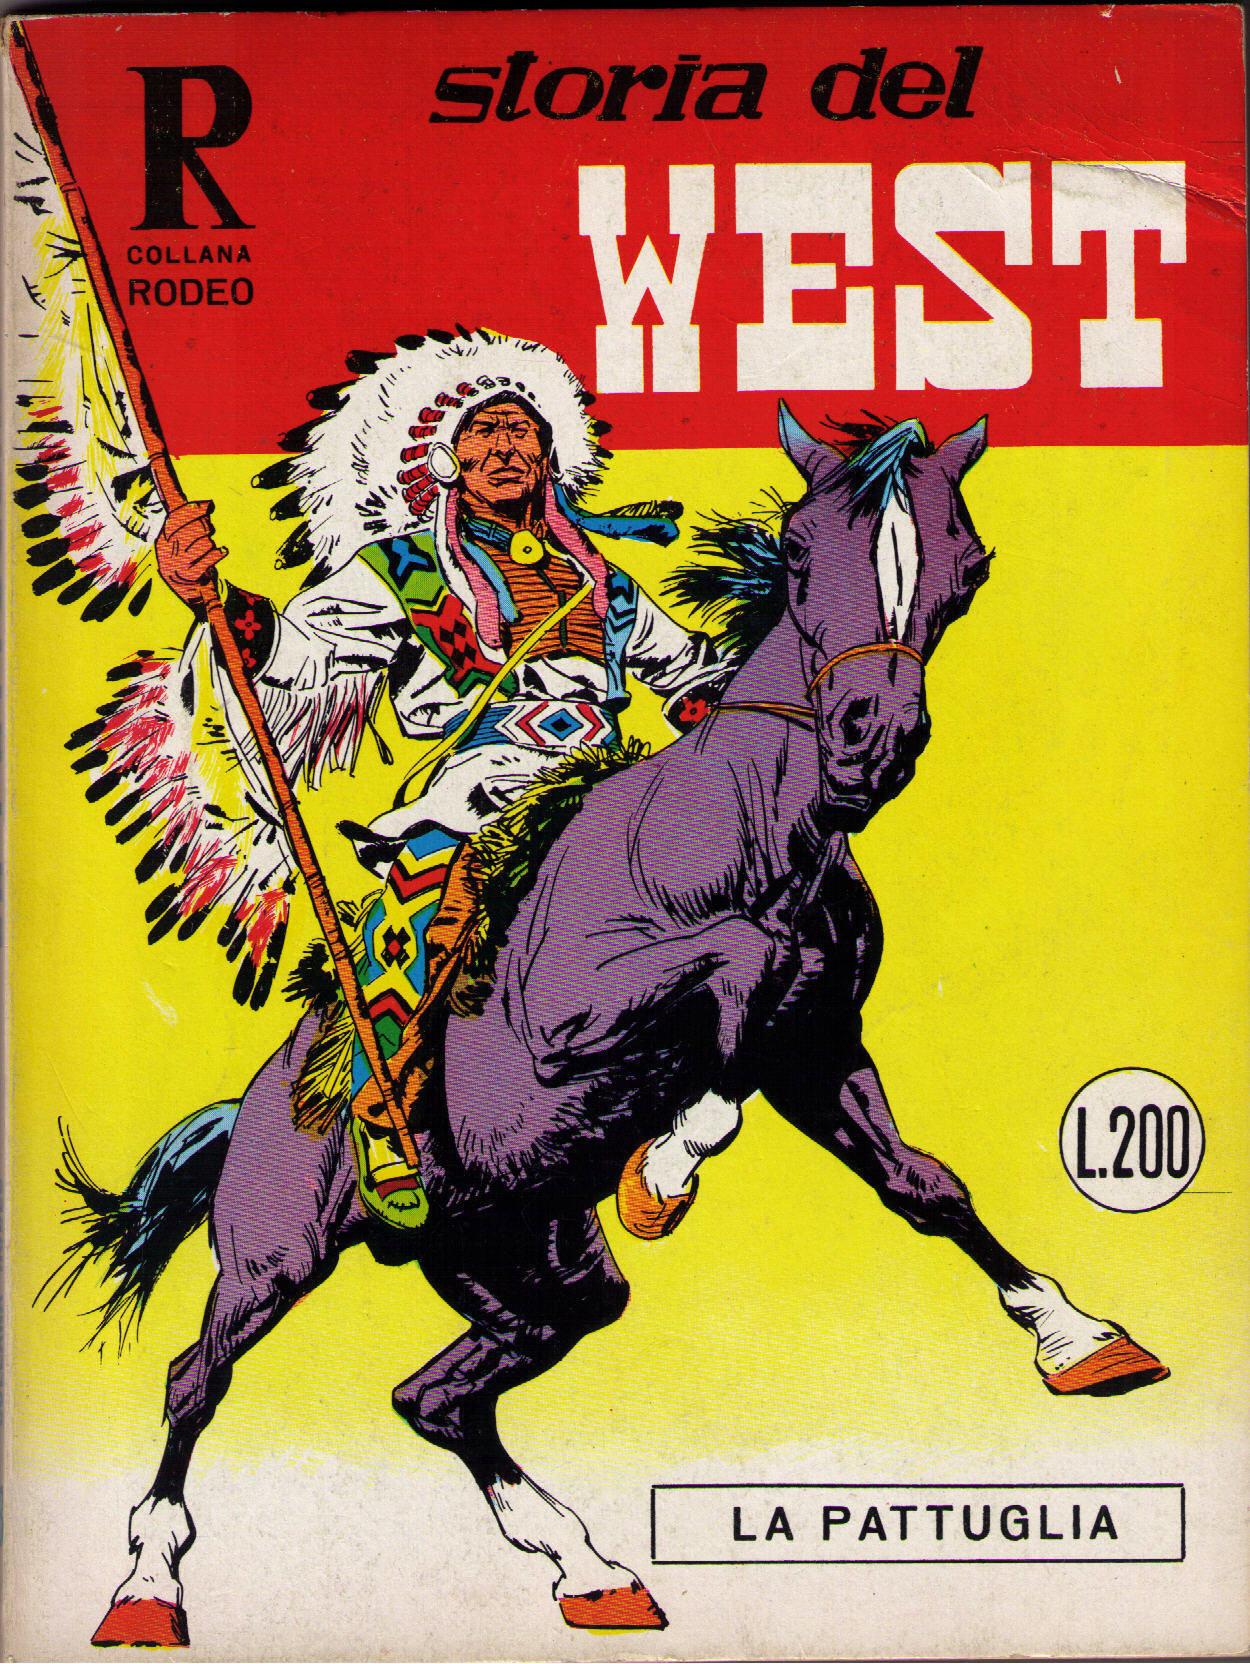 Storia del west n. 8 (collana Rodeo n. 13)